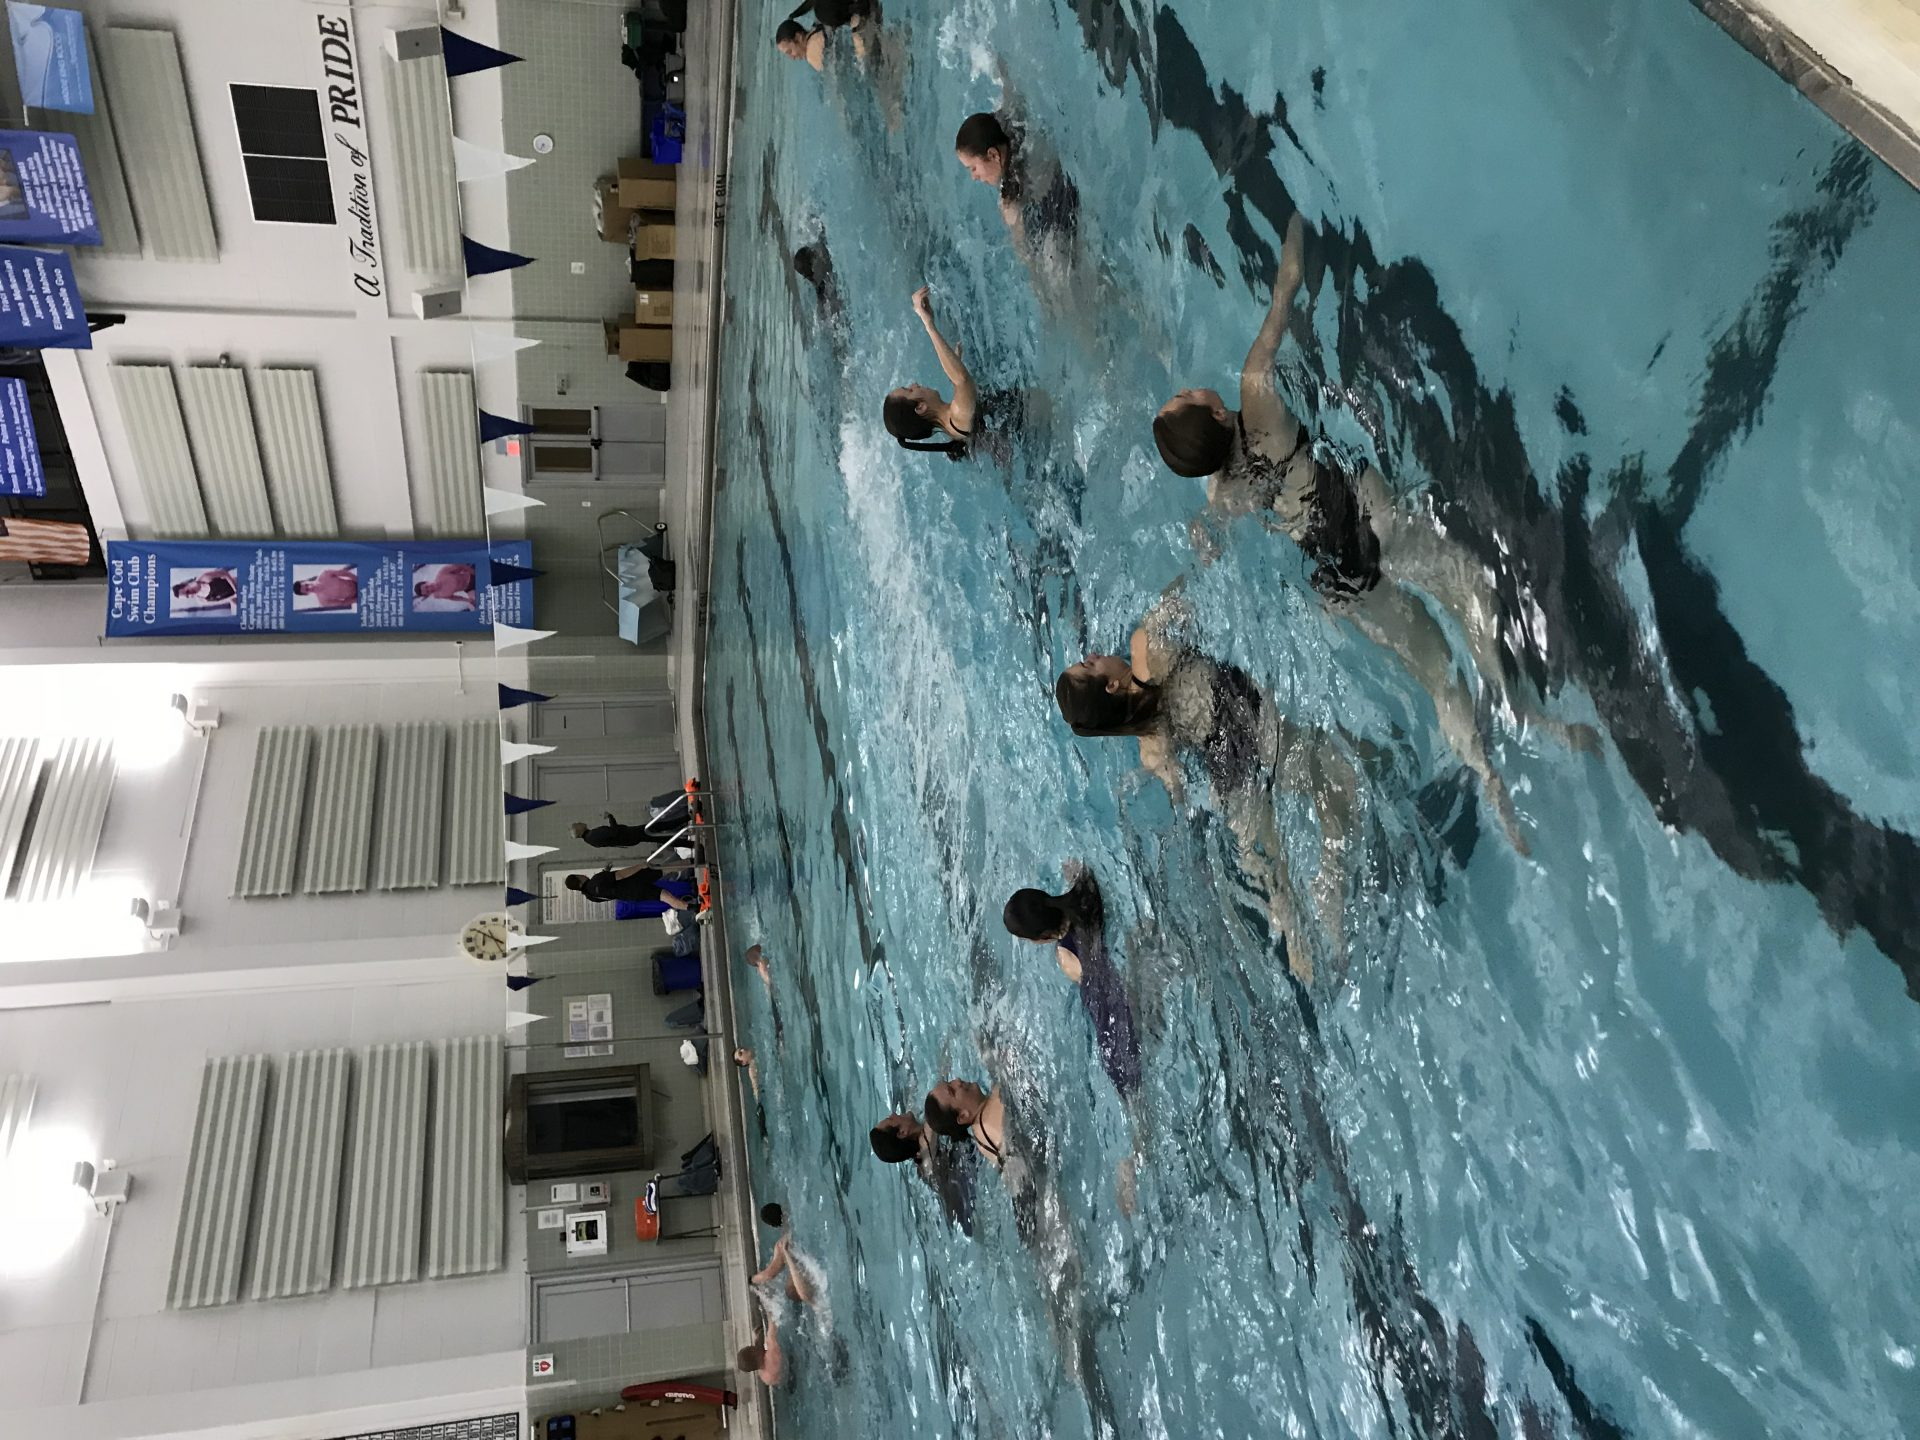 scuba divers swimming in pool